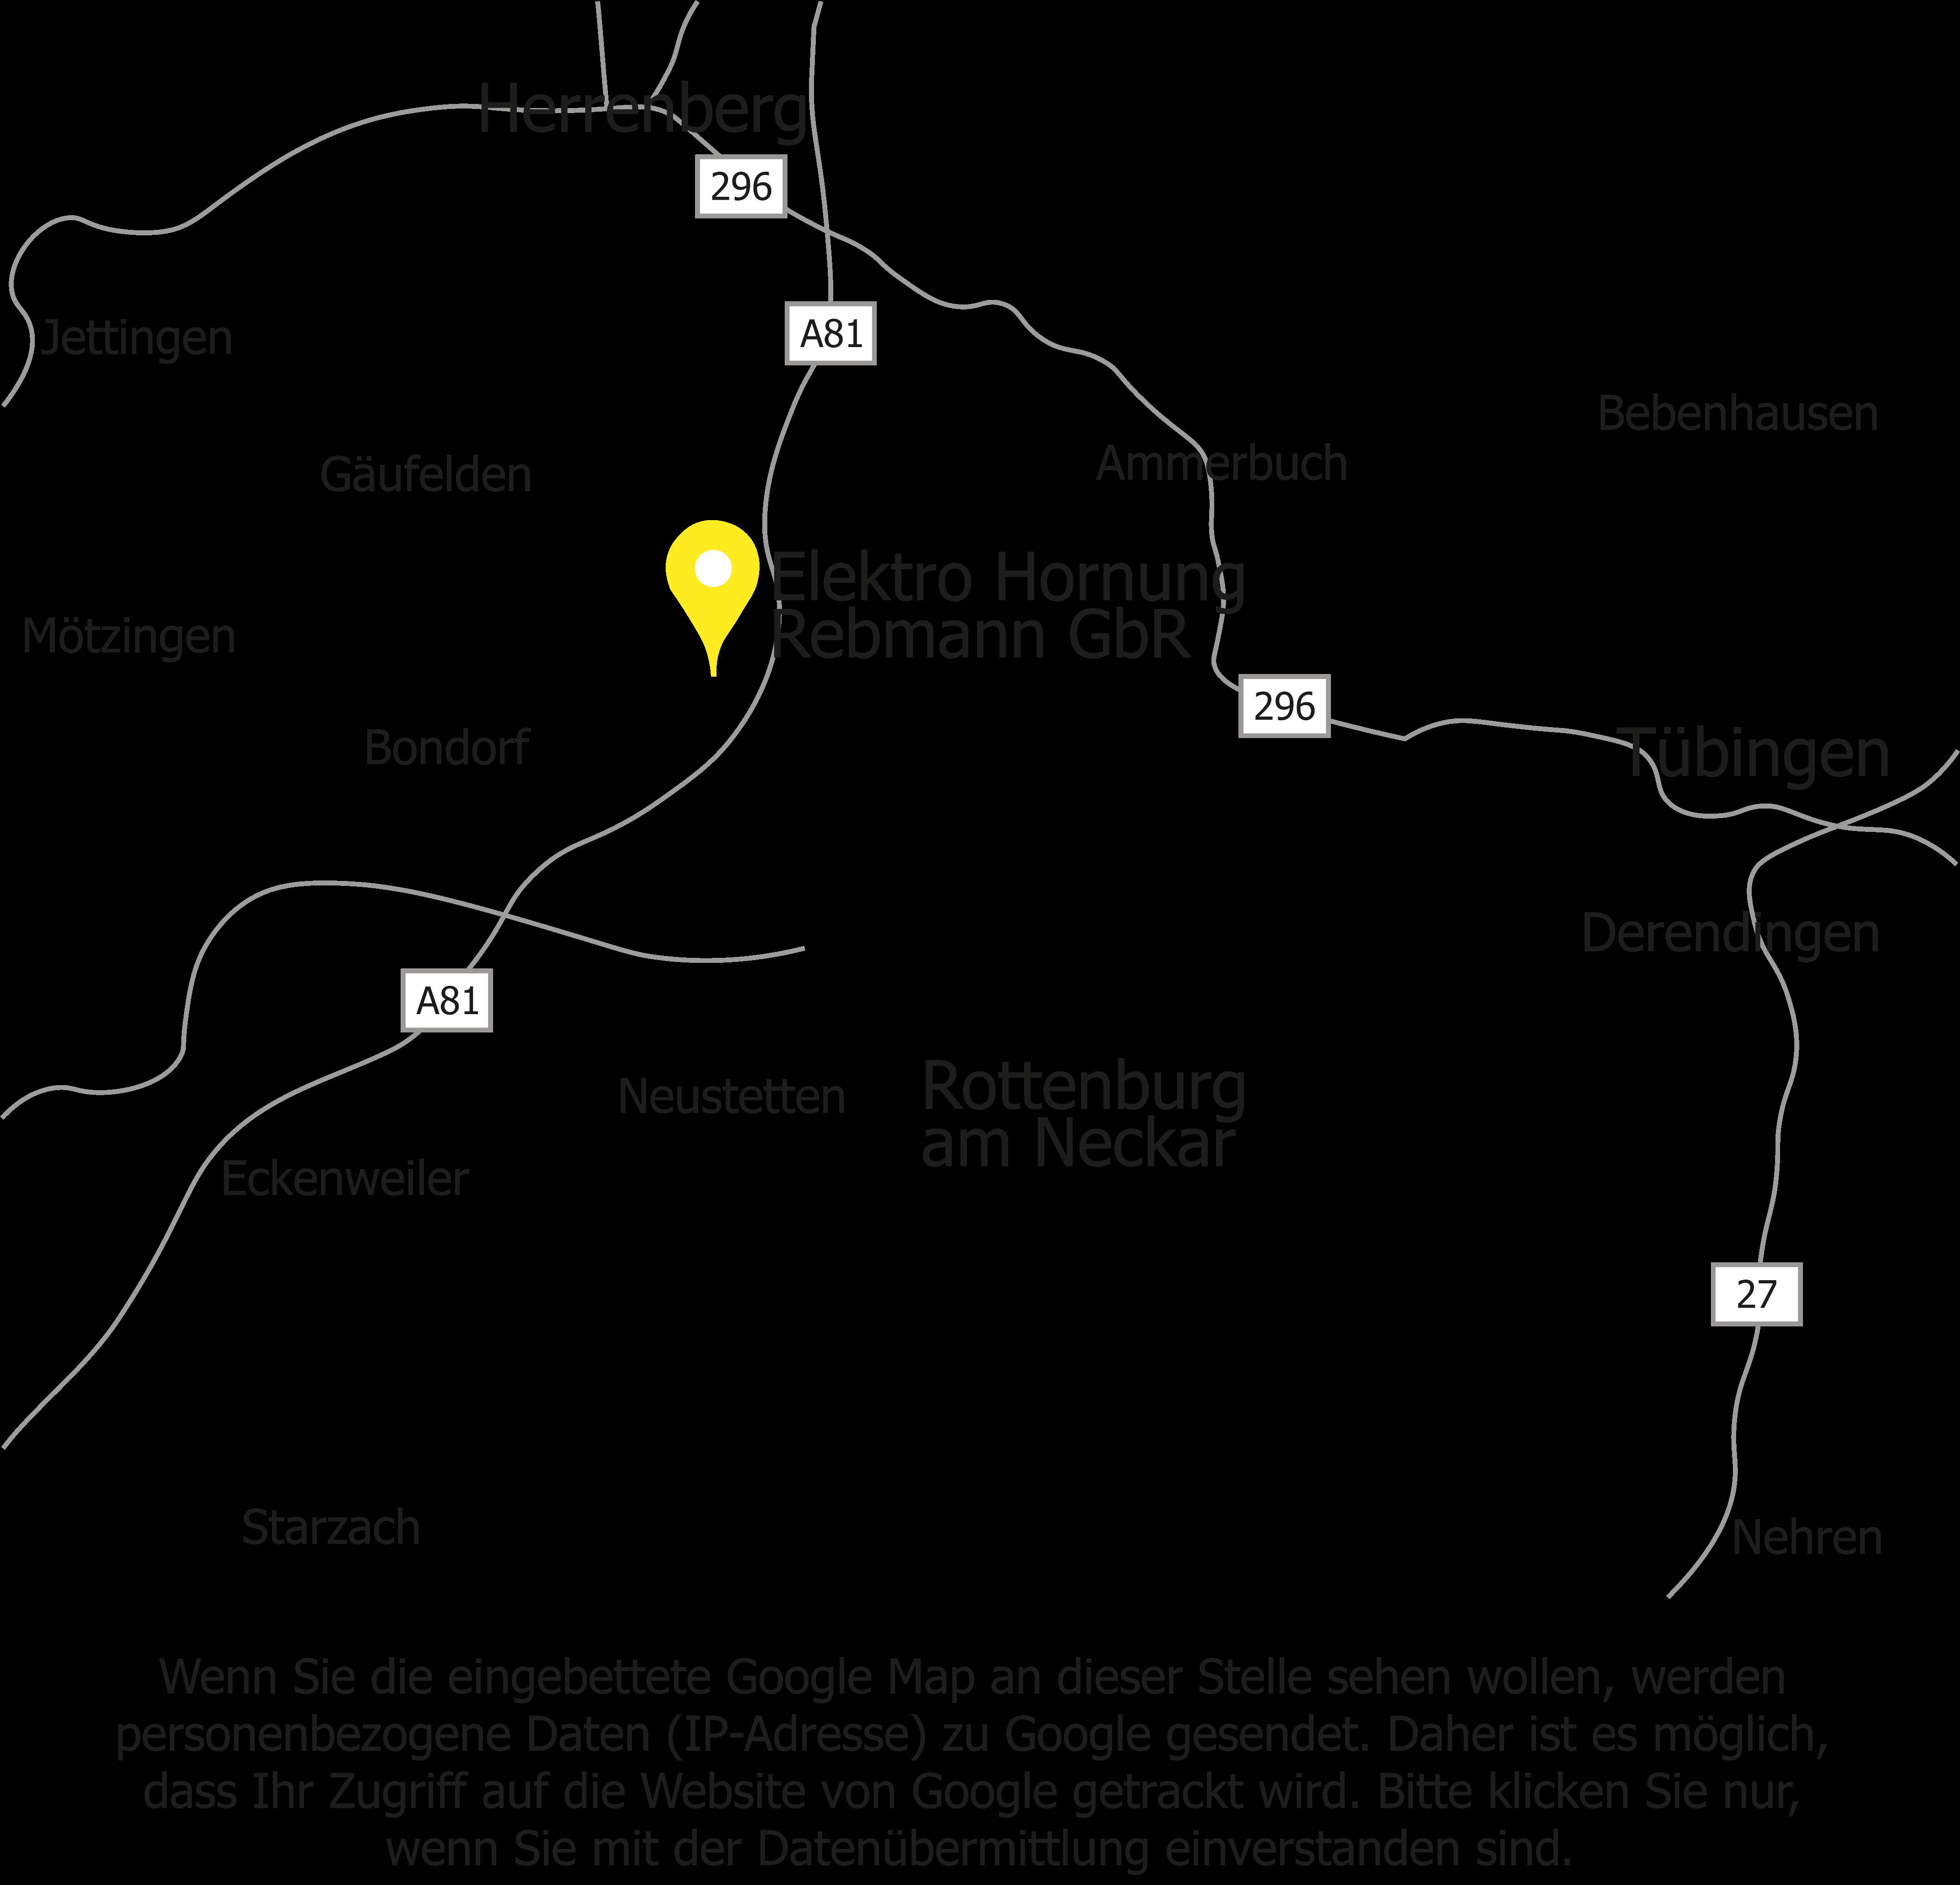 Standort Hornung Rebmann GbR